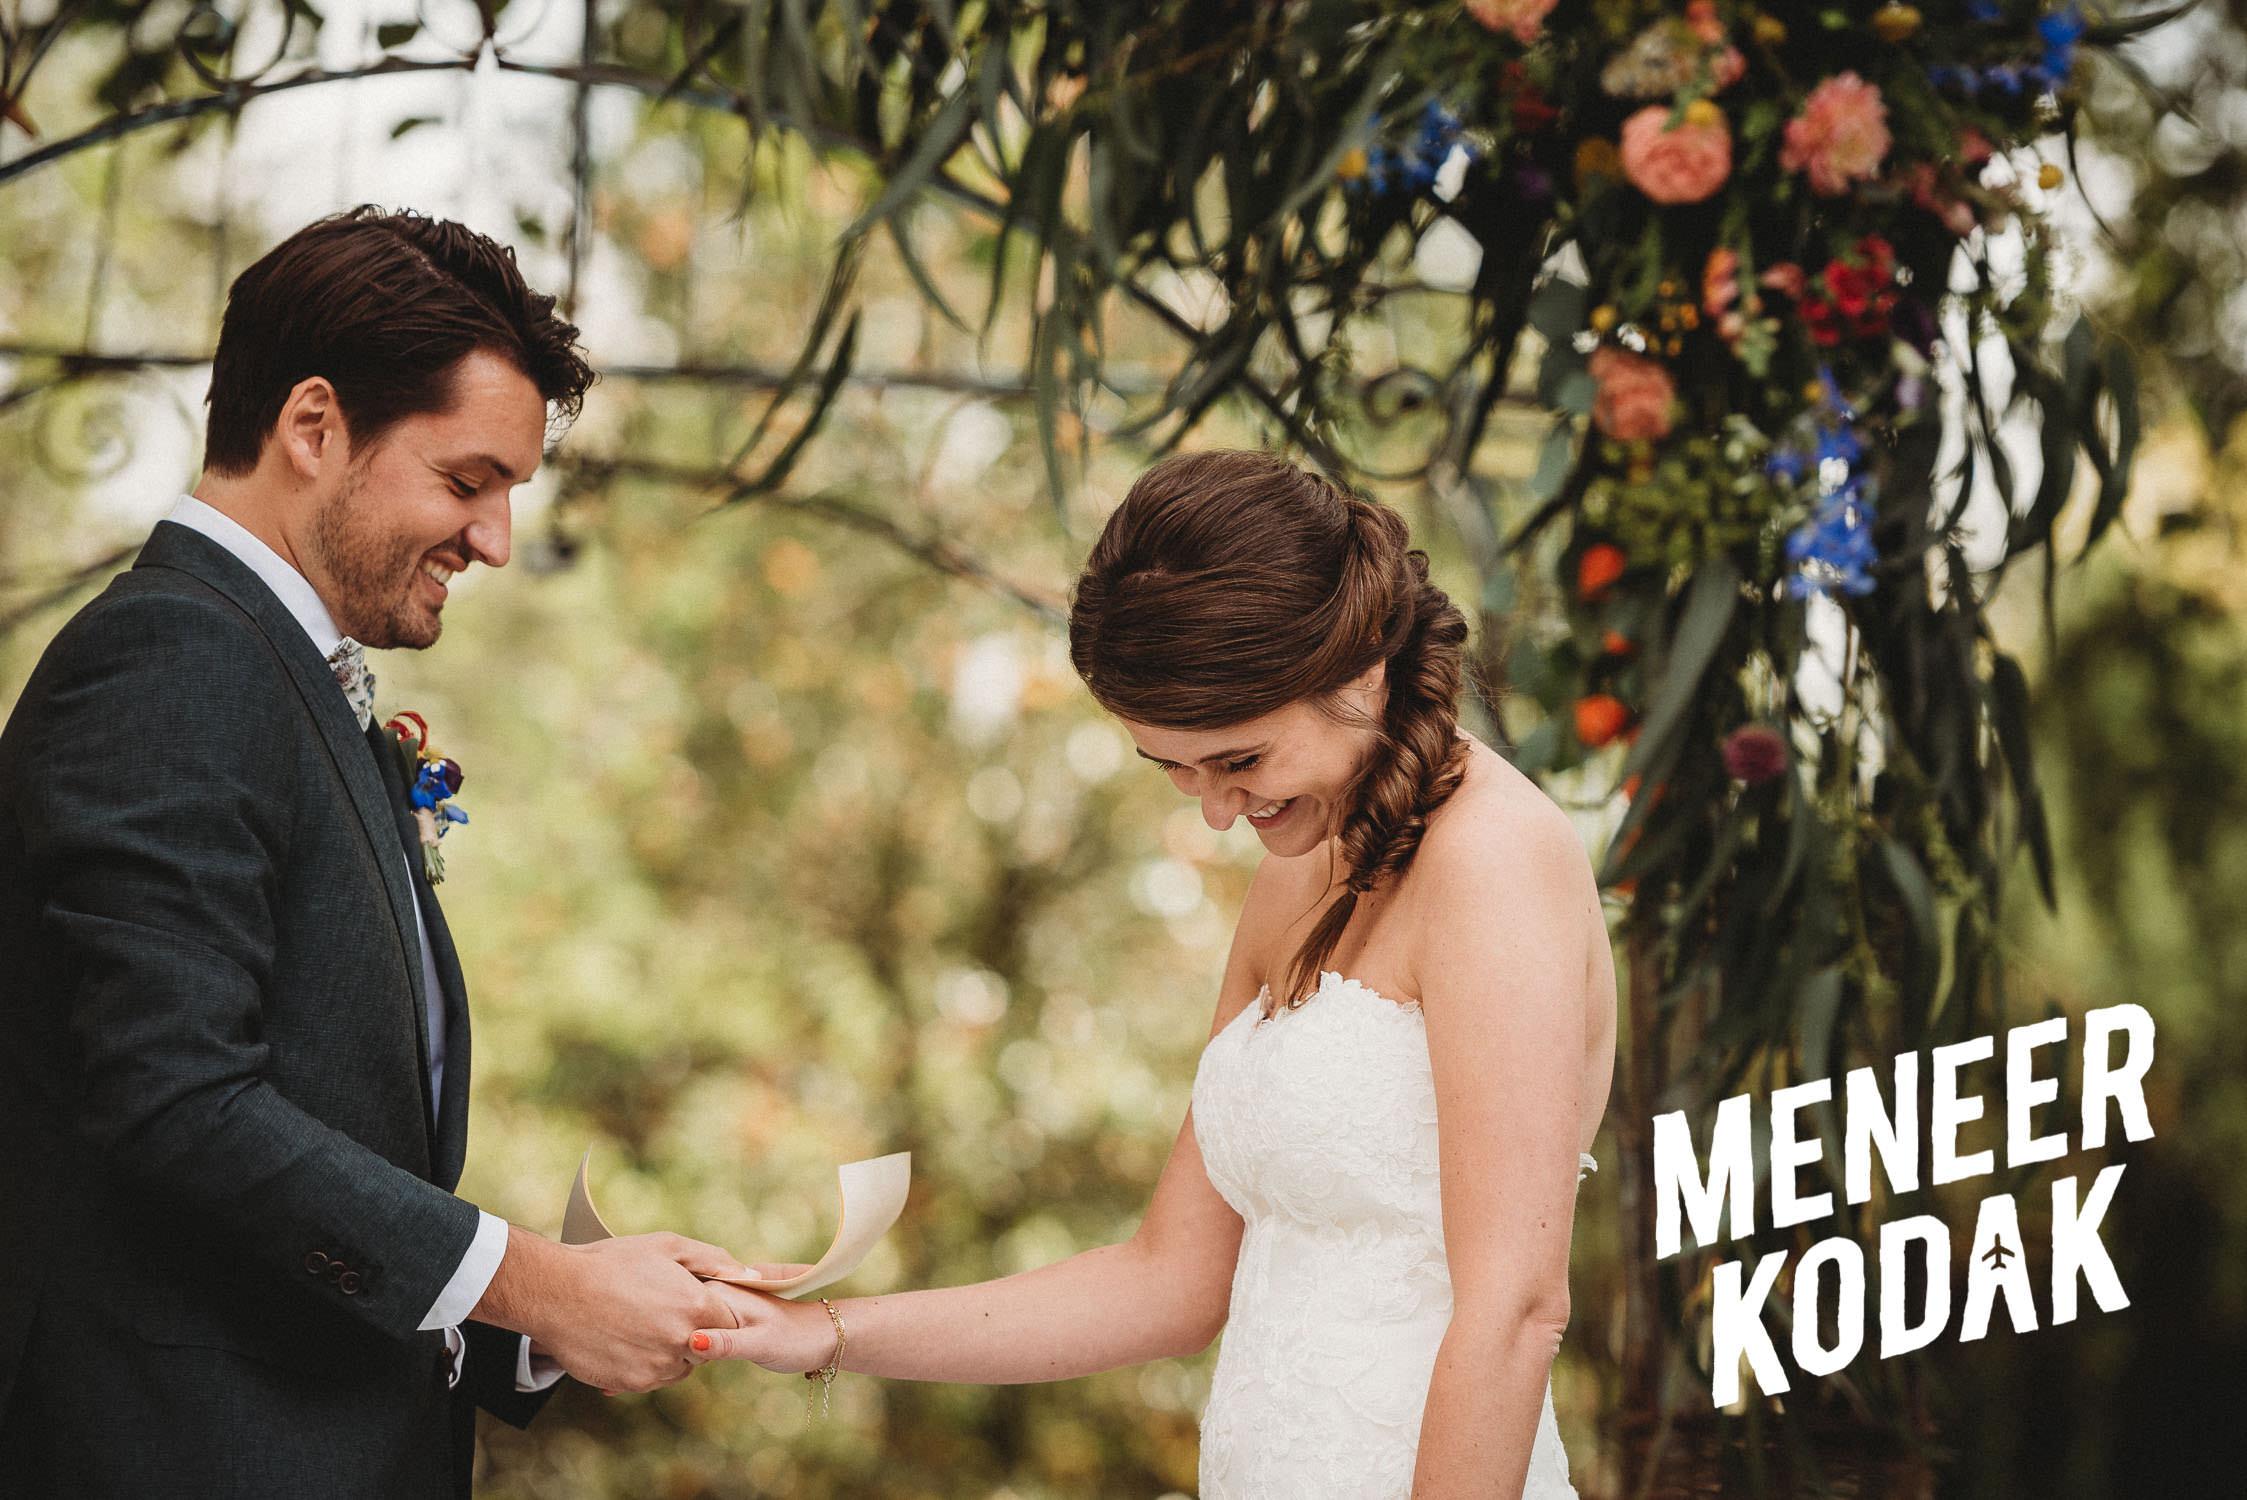 Meneer Kodak - Trouwreportage - Breda - E&M-107.jpg